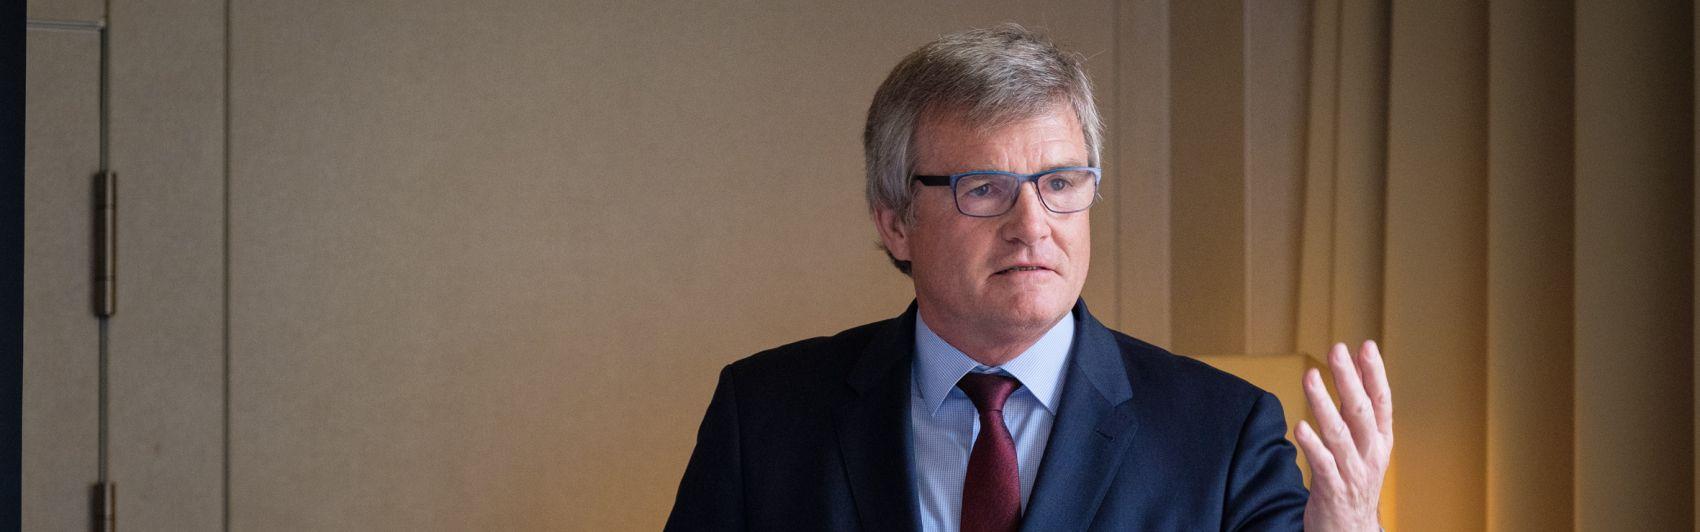 UVB-Präsident Dr. Frank Büchner